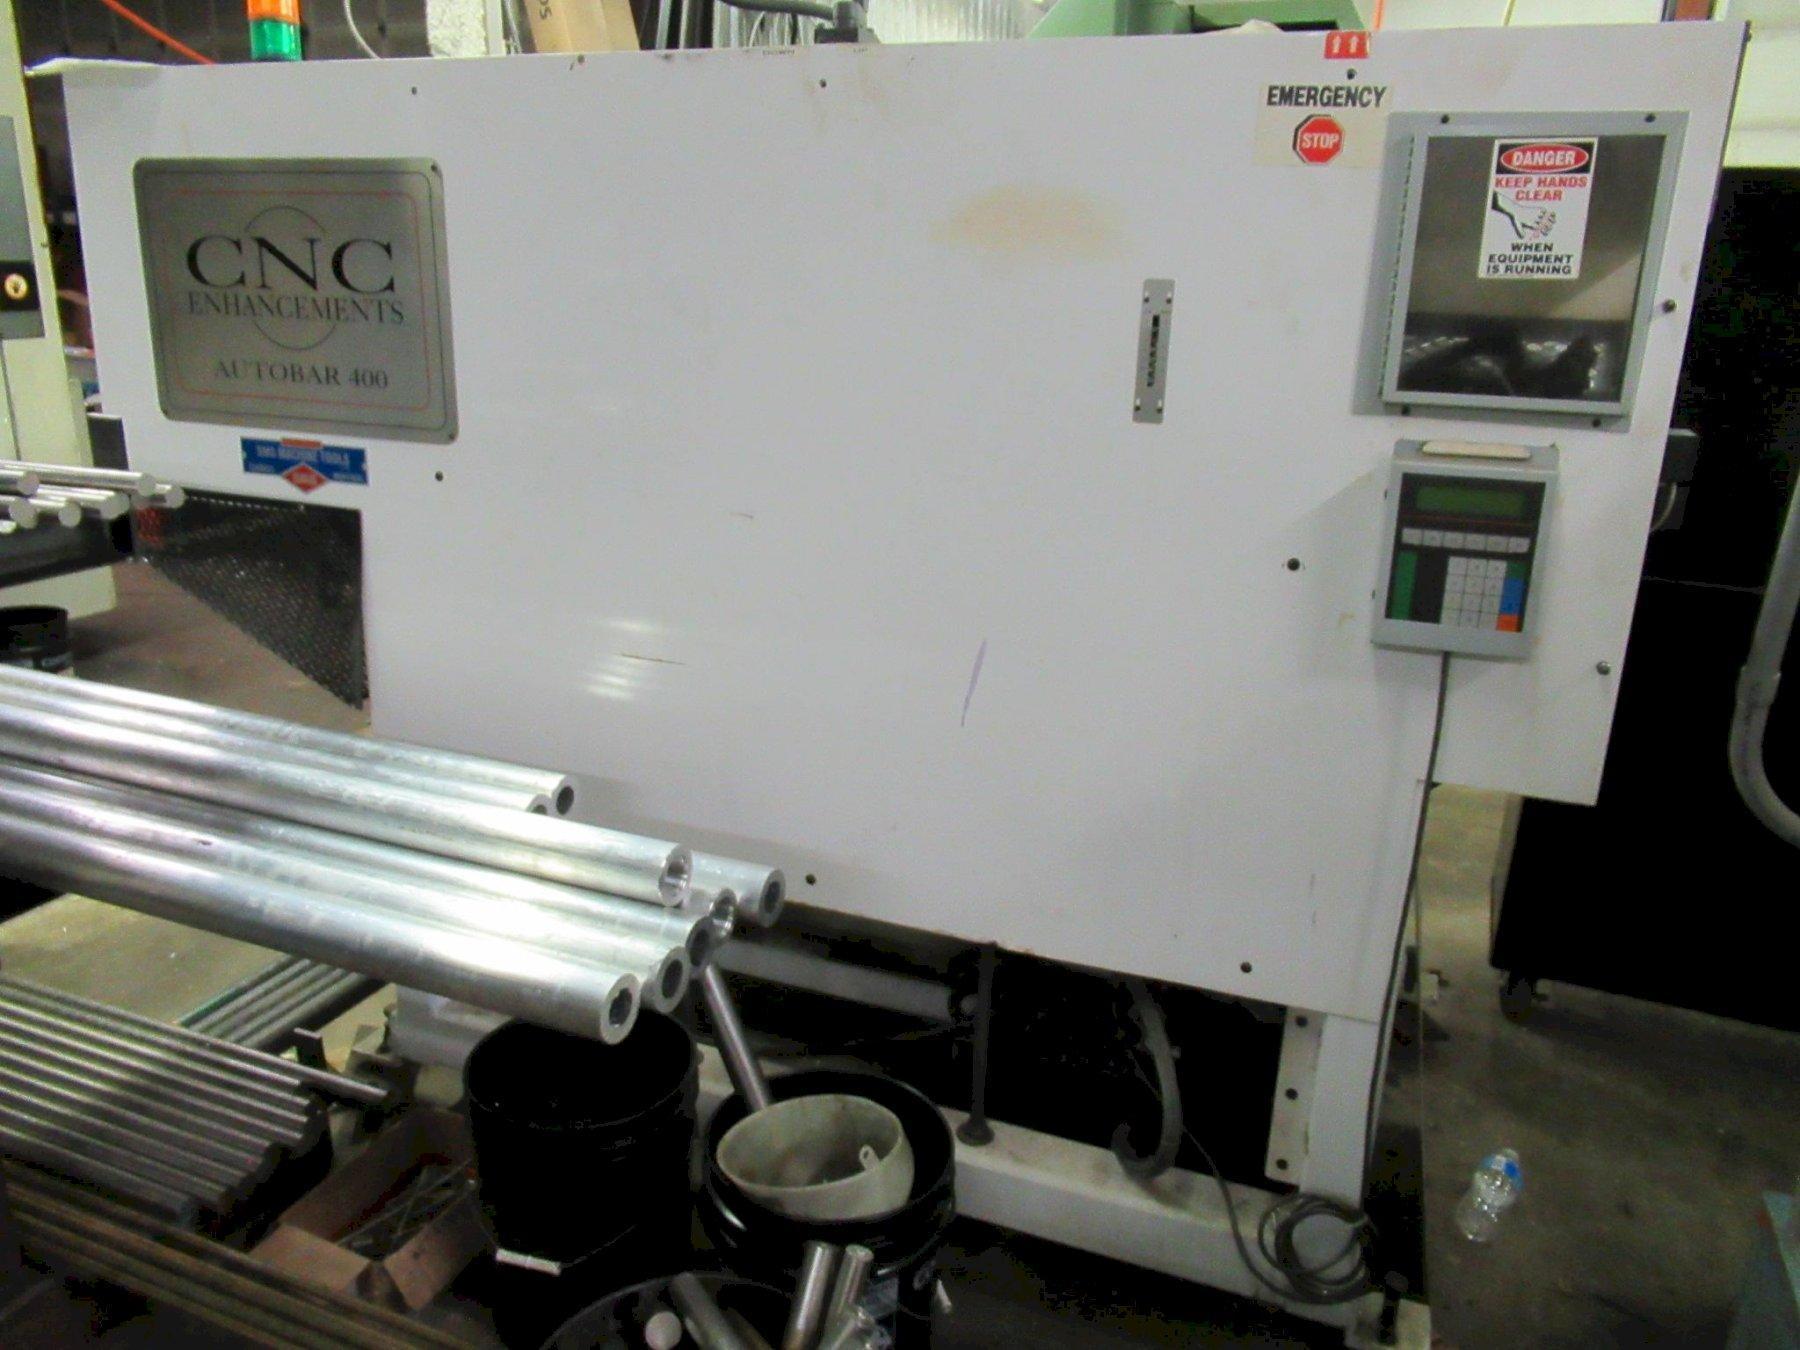 CNC Enhancements Autobar 400